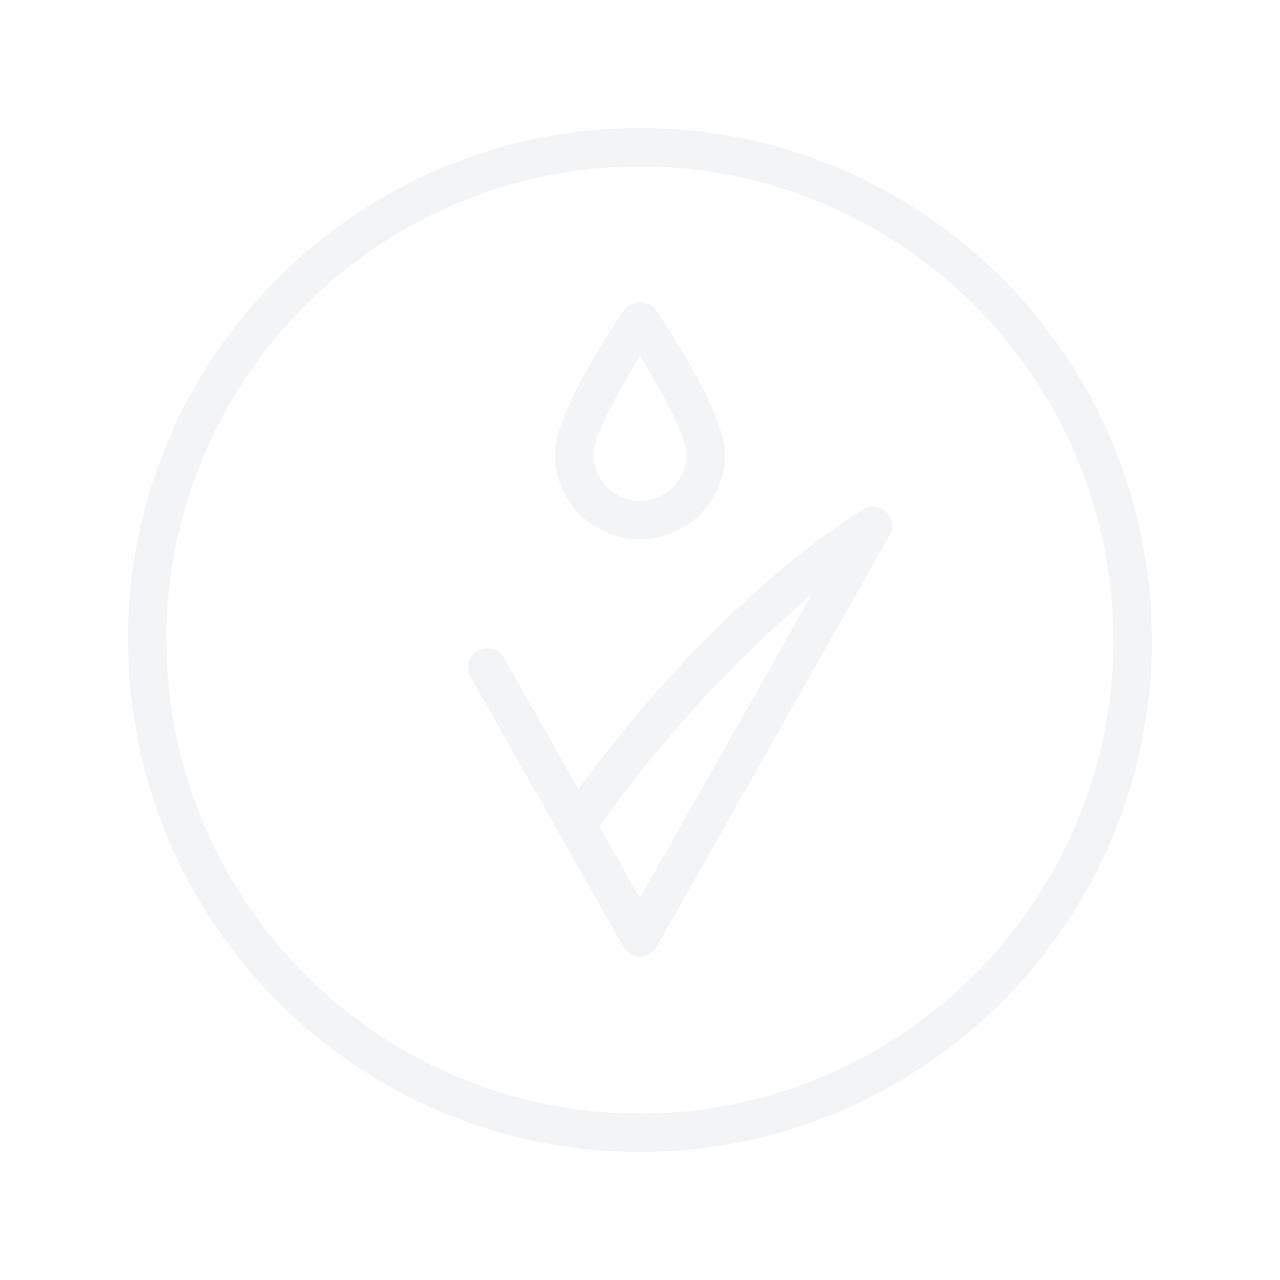 BIODROGA Anti-Age Cell Firming Eye Care 15ml